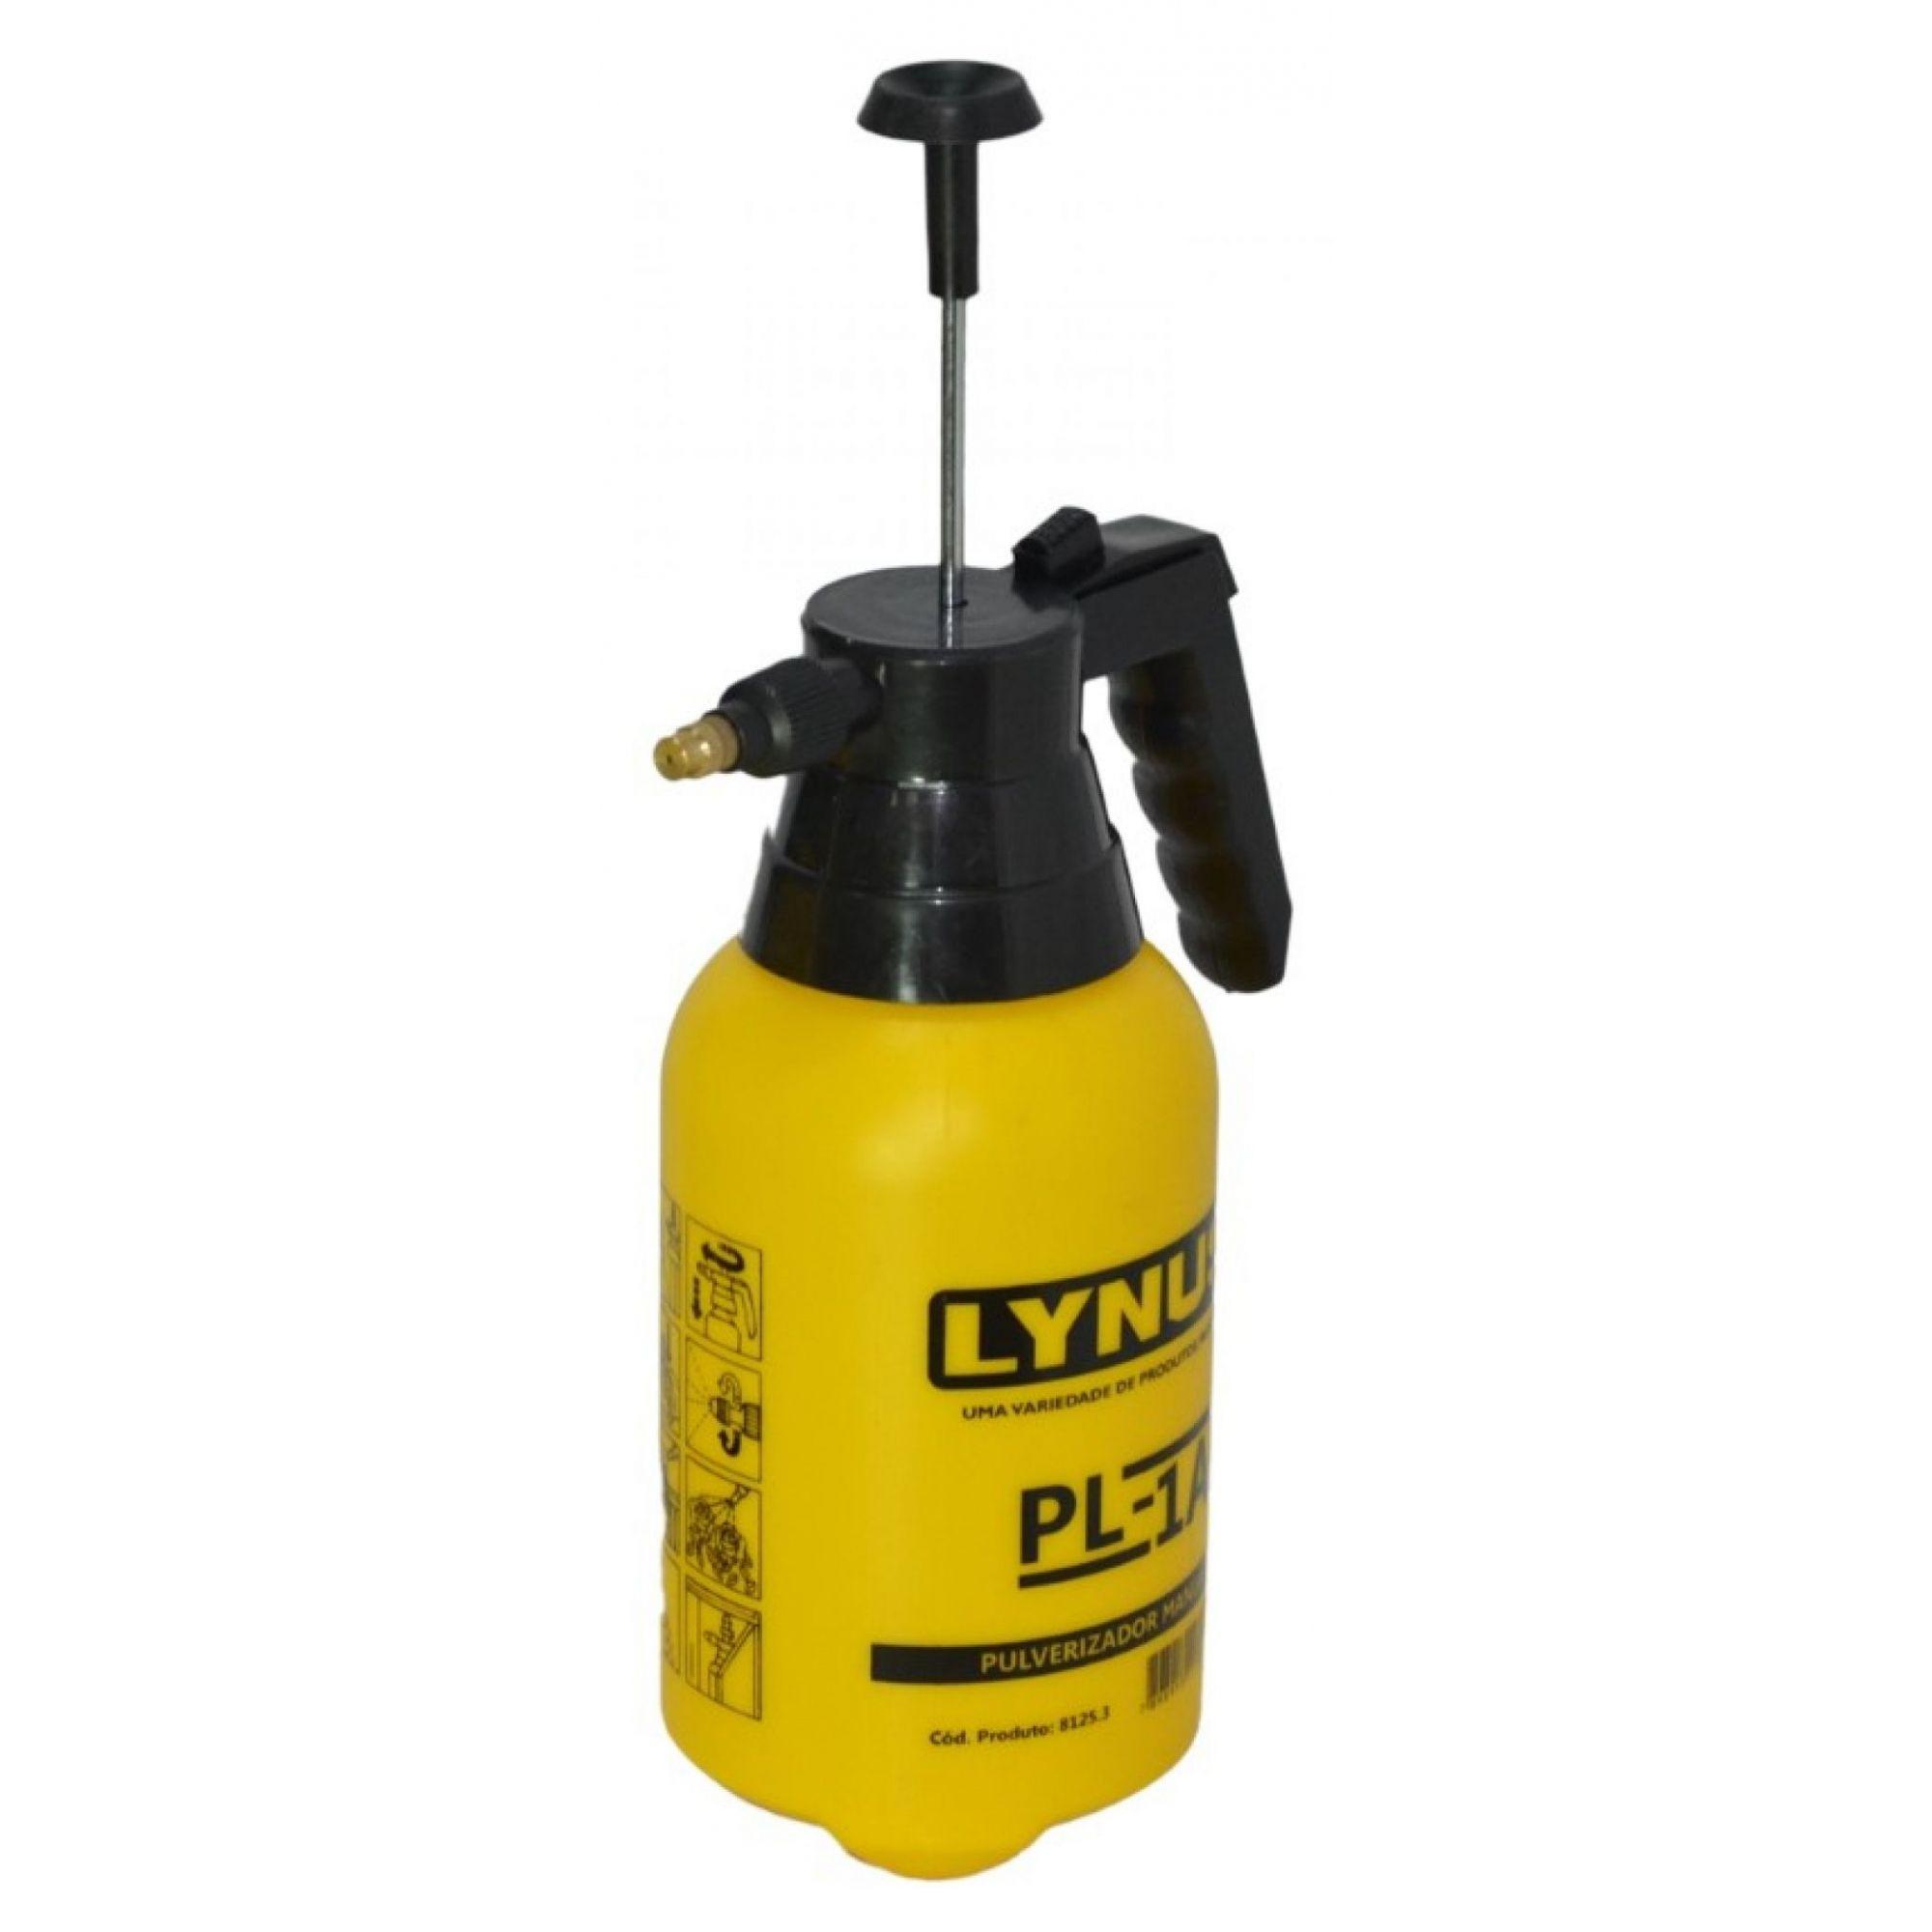 Pulverizador Manual – PL-1A – Lynus